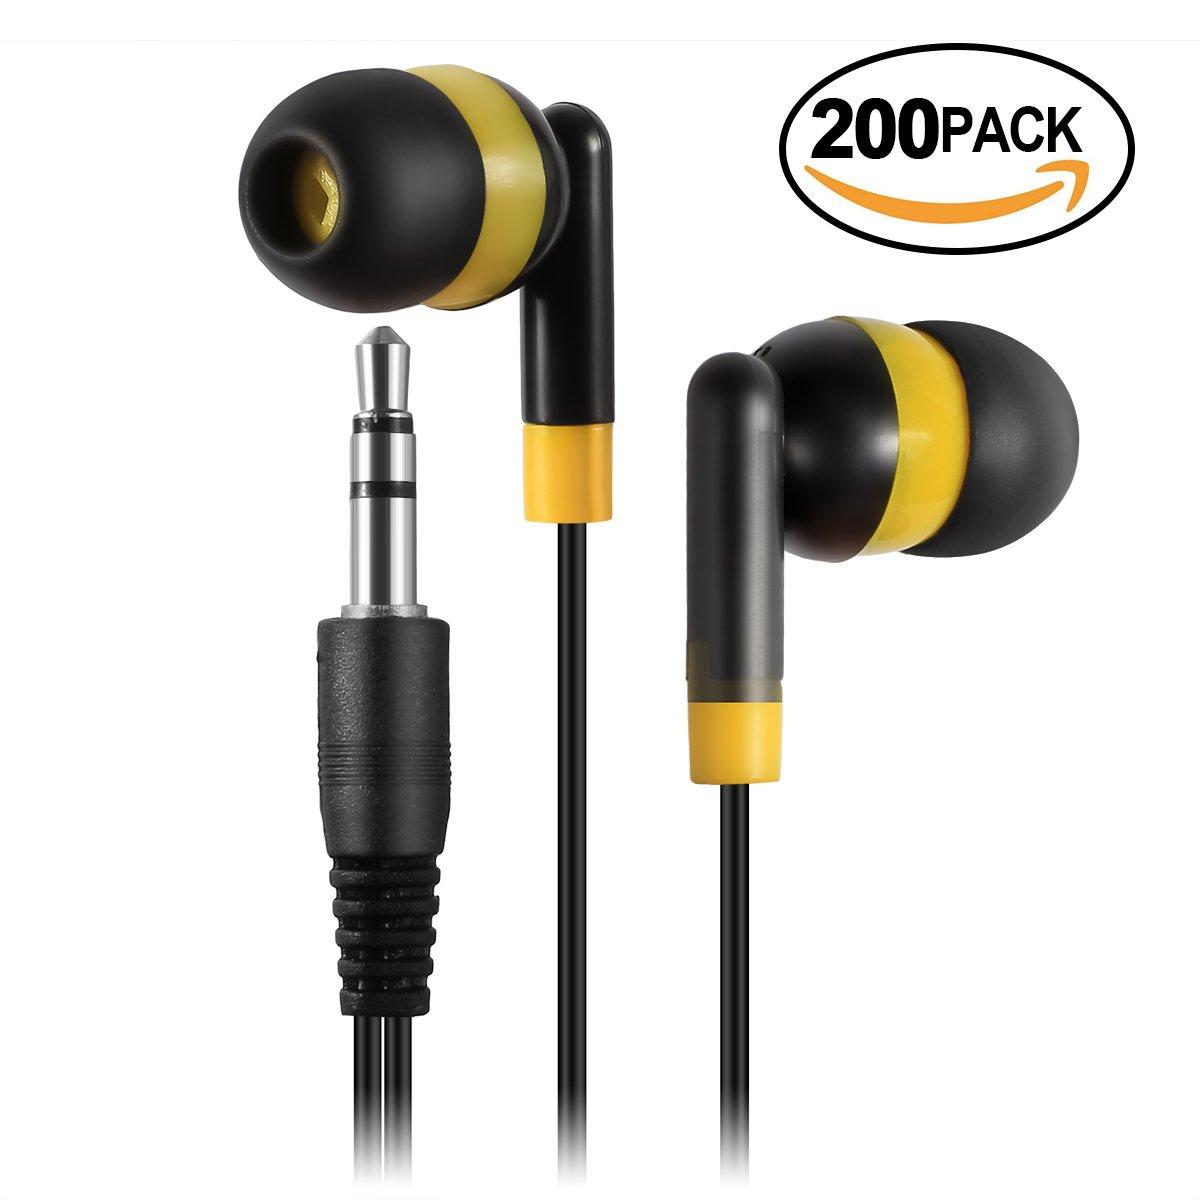 Keewonda Earphones Bulk Earbuds Headphones - 200 Pack Ear Buds Kids Bulk Headphones Wholesale Disposable Earbuds for School Classroom Students (Black/Yellow) by Keewonda